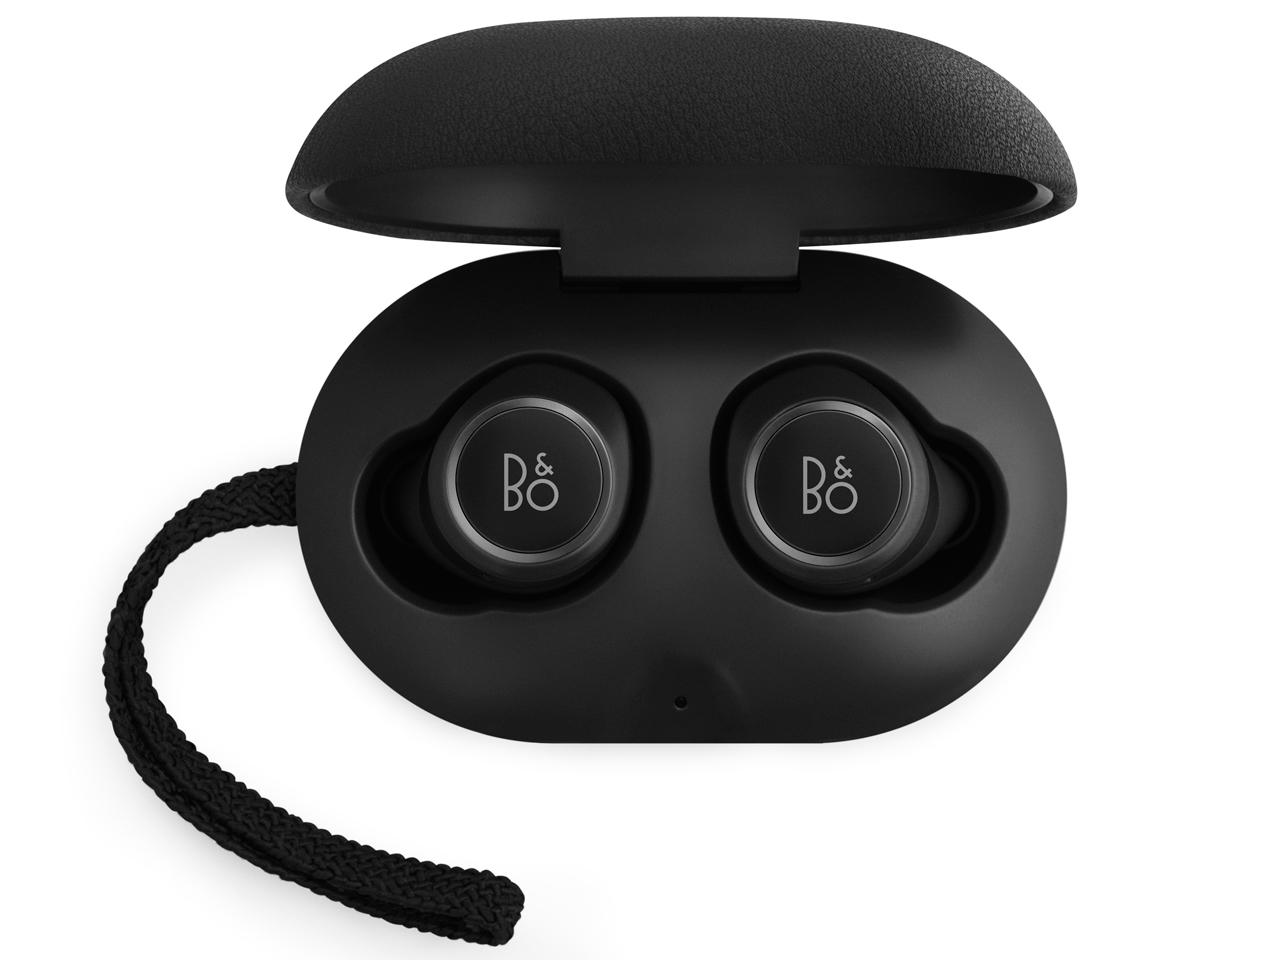 『本体 充電時』 B&O PLAY Beoplay E8 [Black] の製品画像